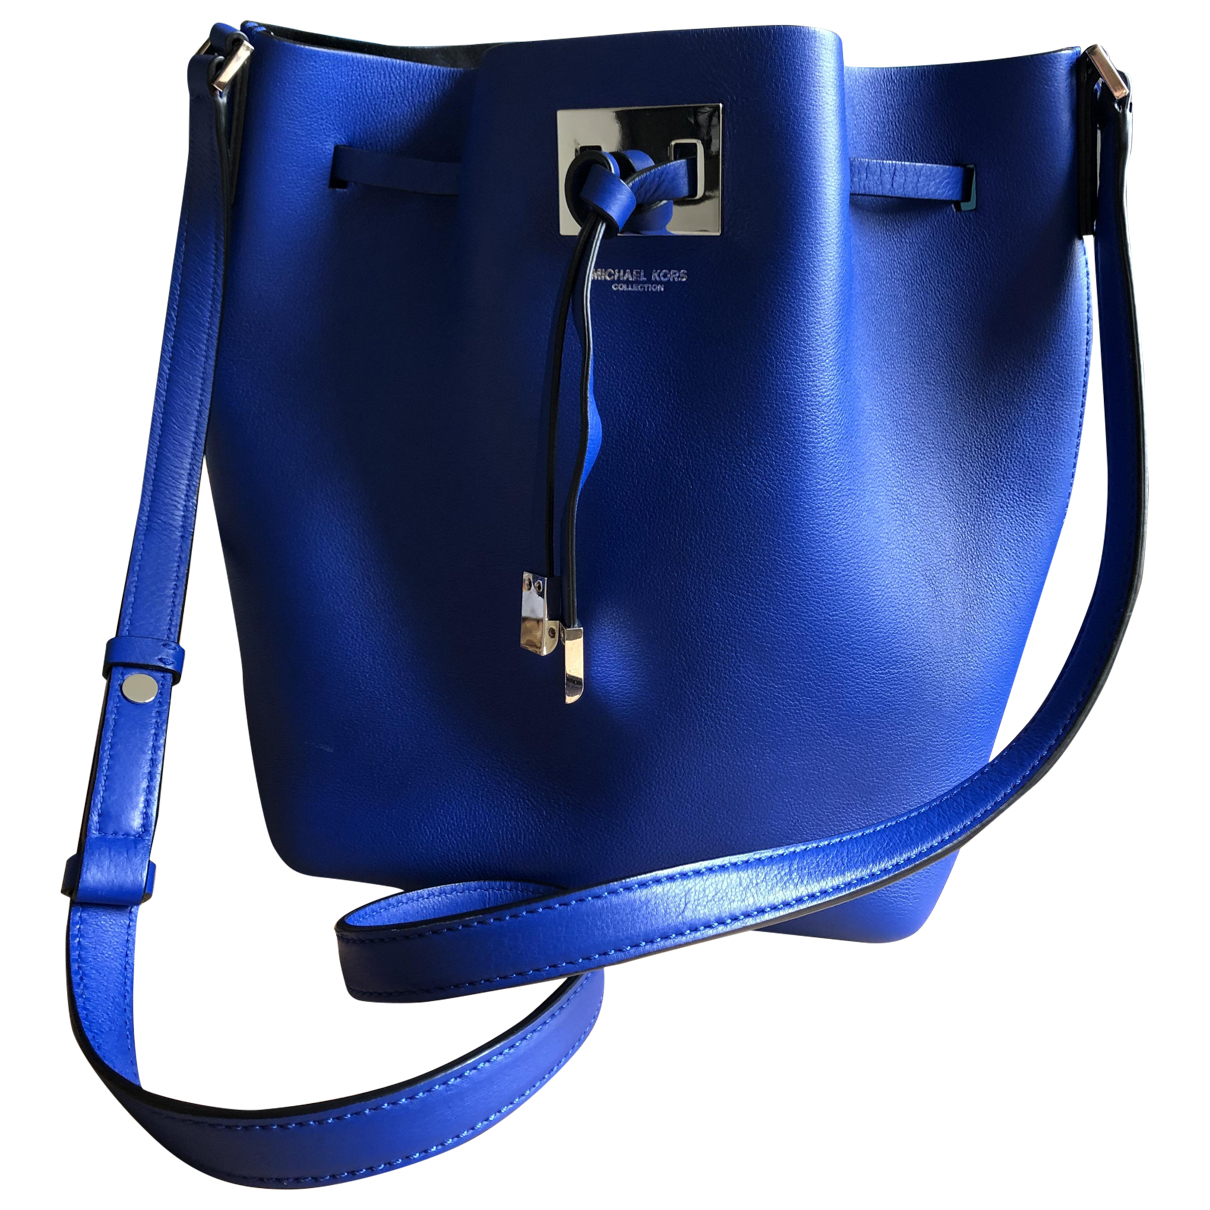 Michael Kors - Sac a main Miranda (Collection) pour femme en cuir - bleu